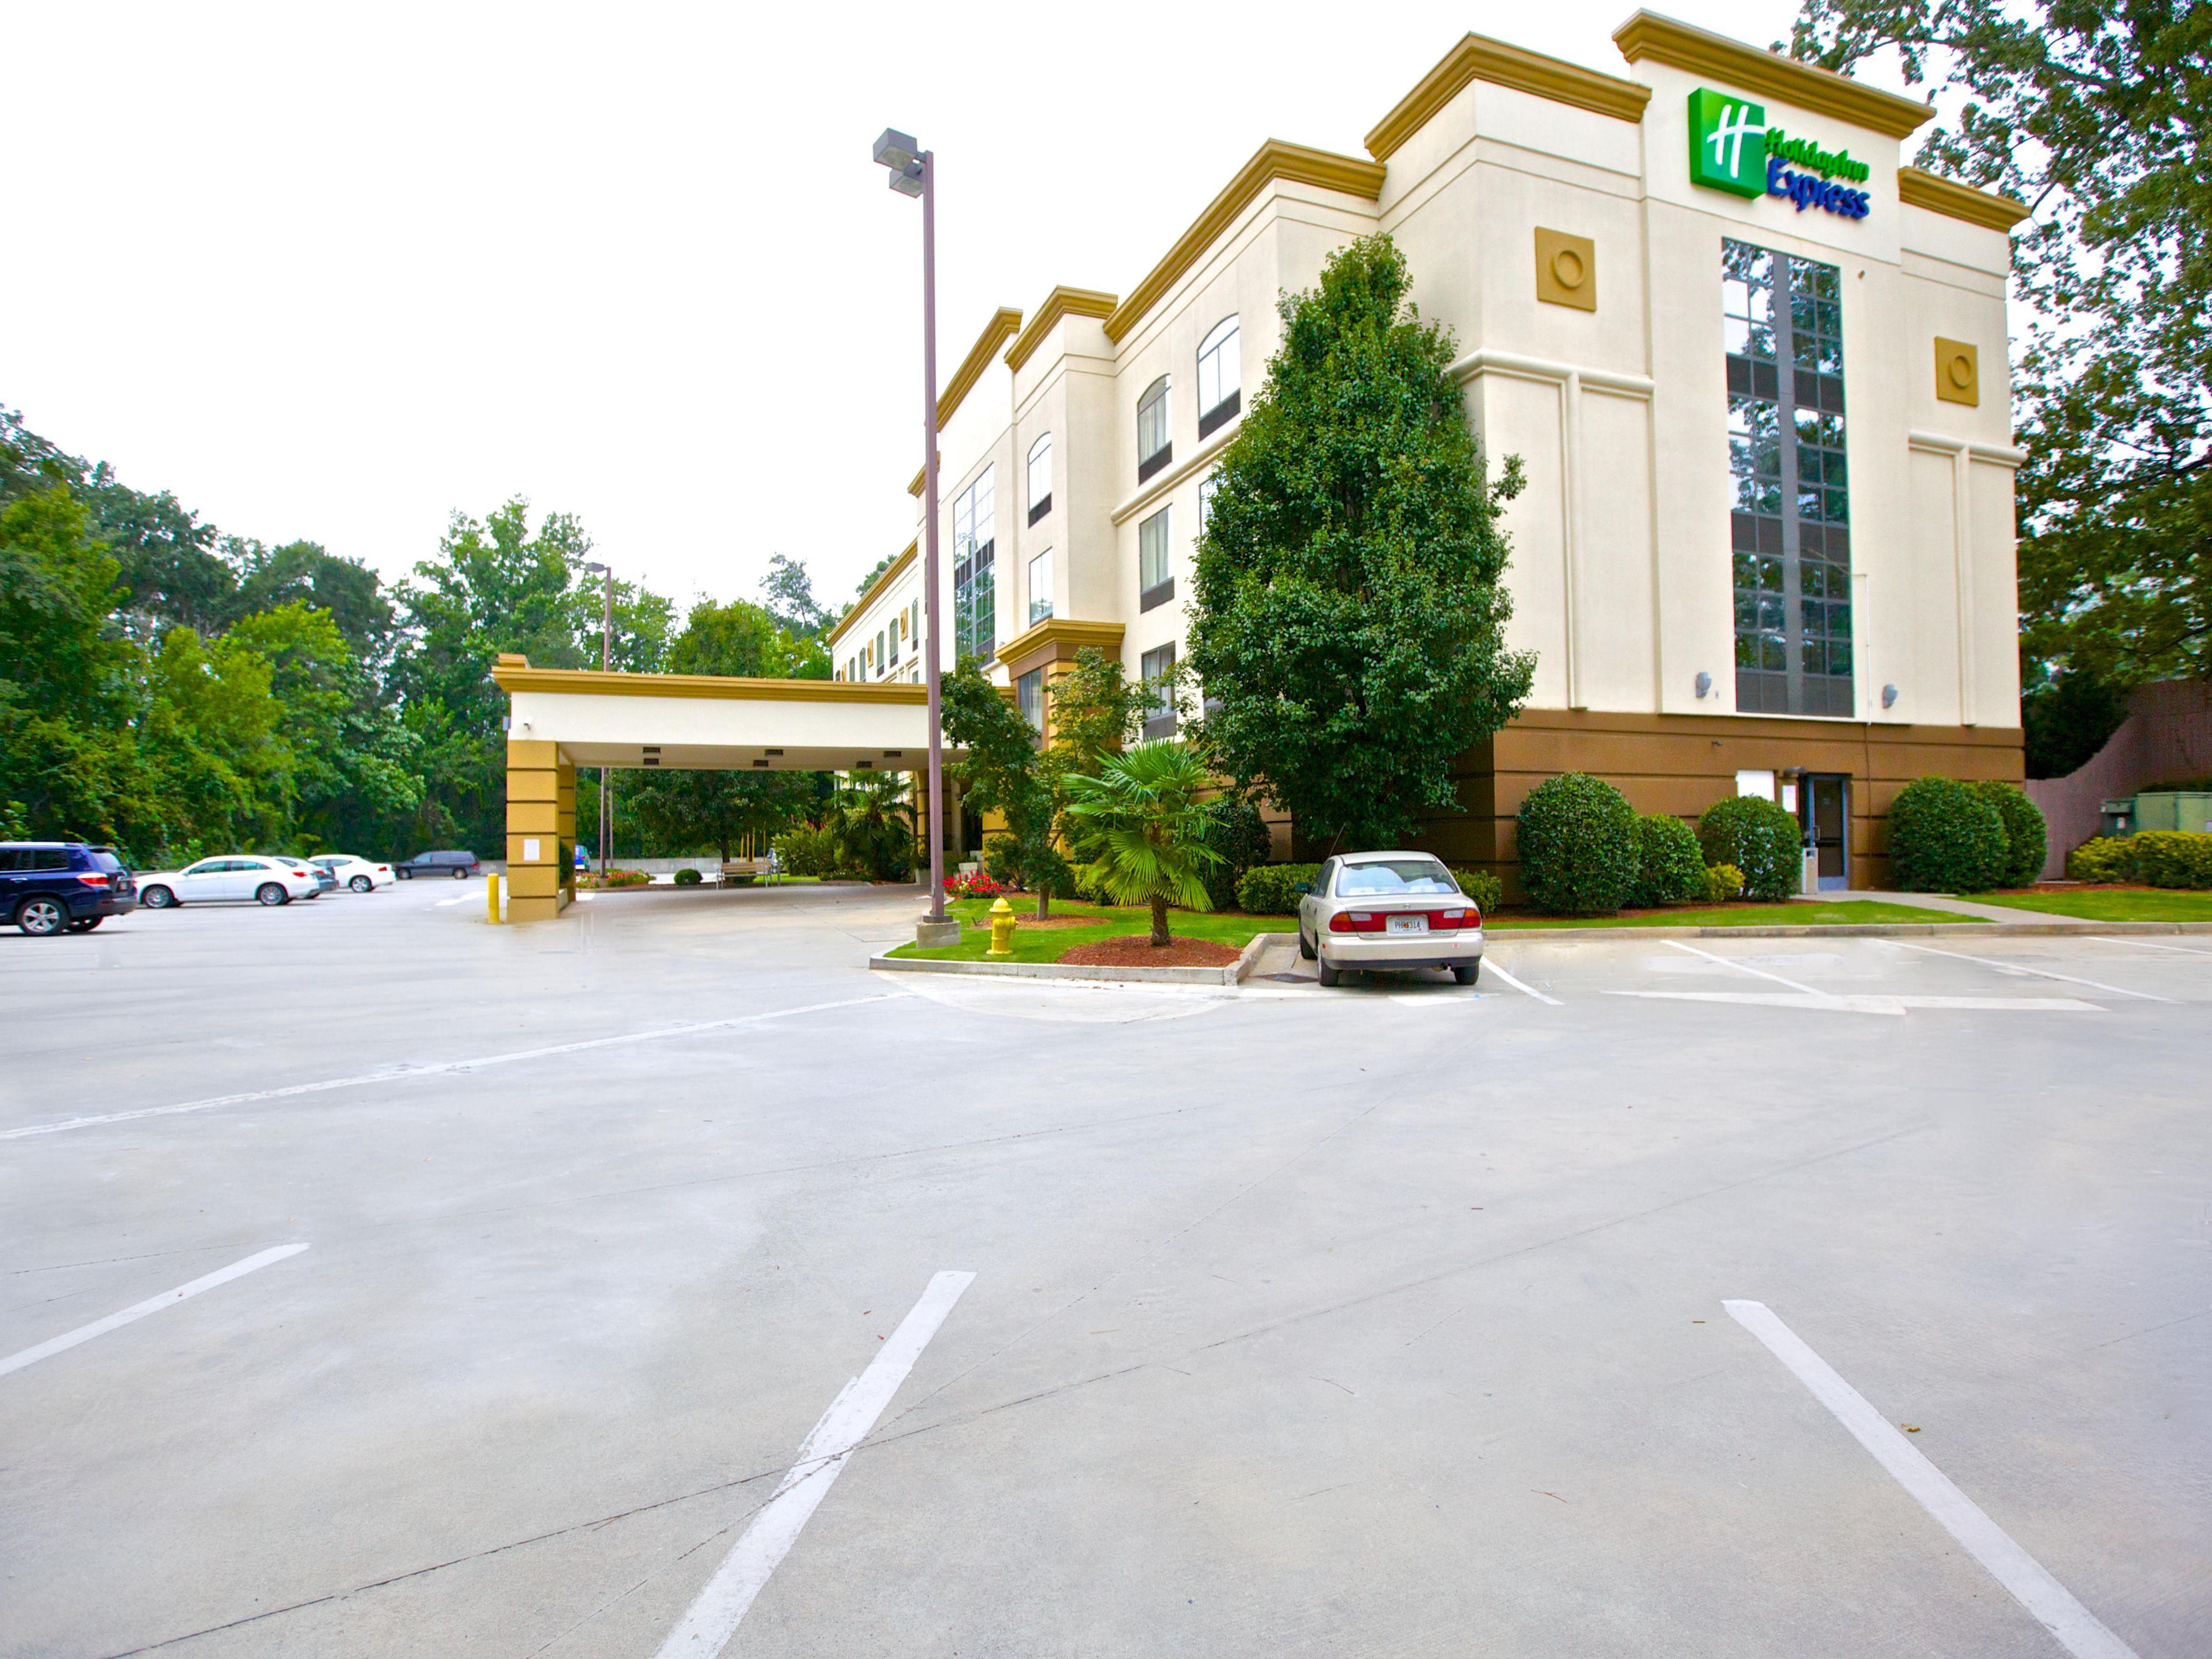 Hotels Near Emory University And Downtown Atlanta   Holiday Inn